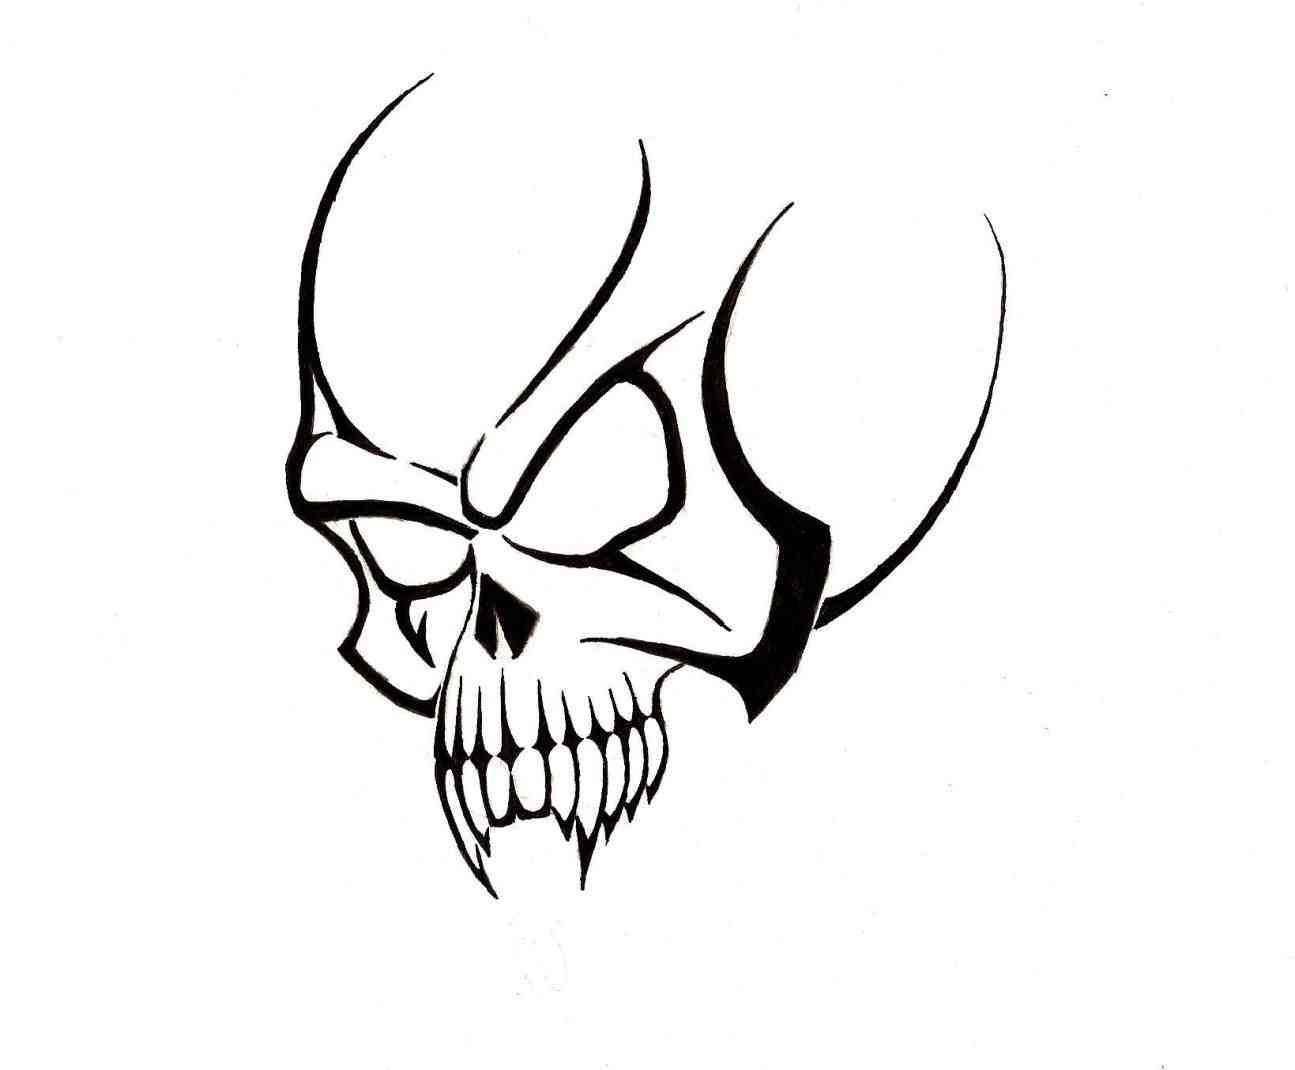 1295x1070 Pencil Drawings Of Tribal Skulls